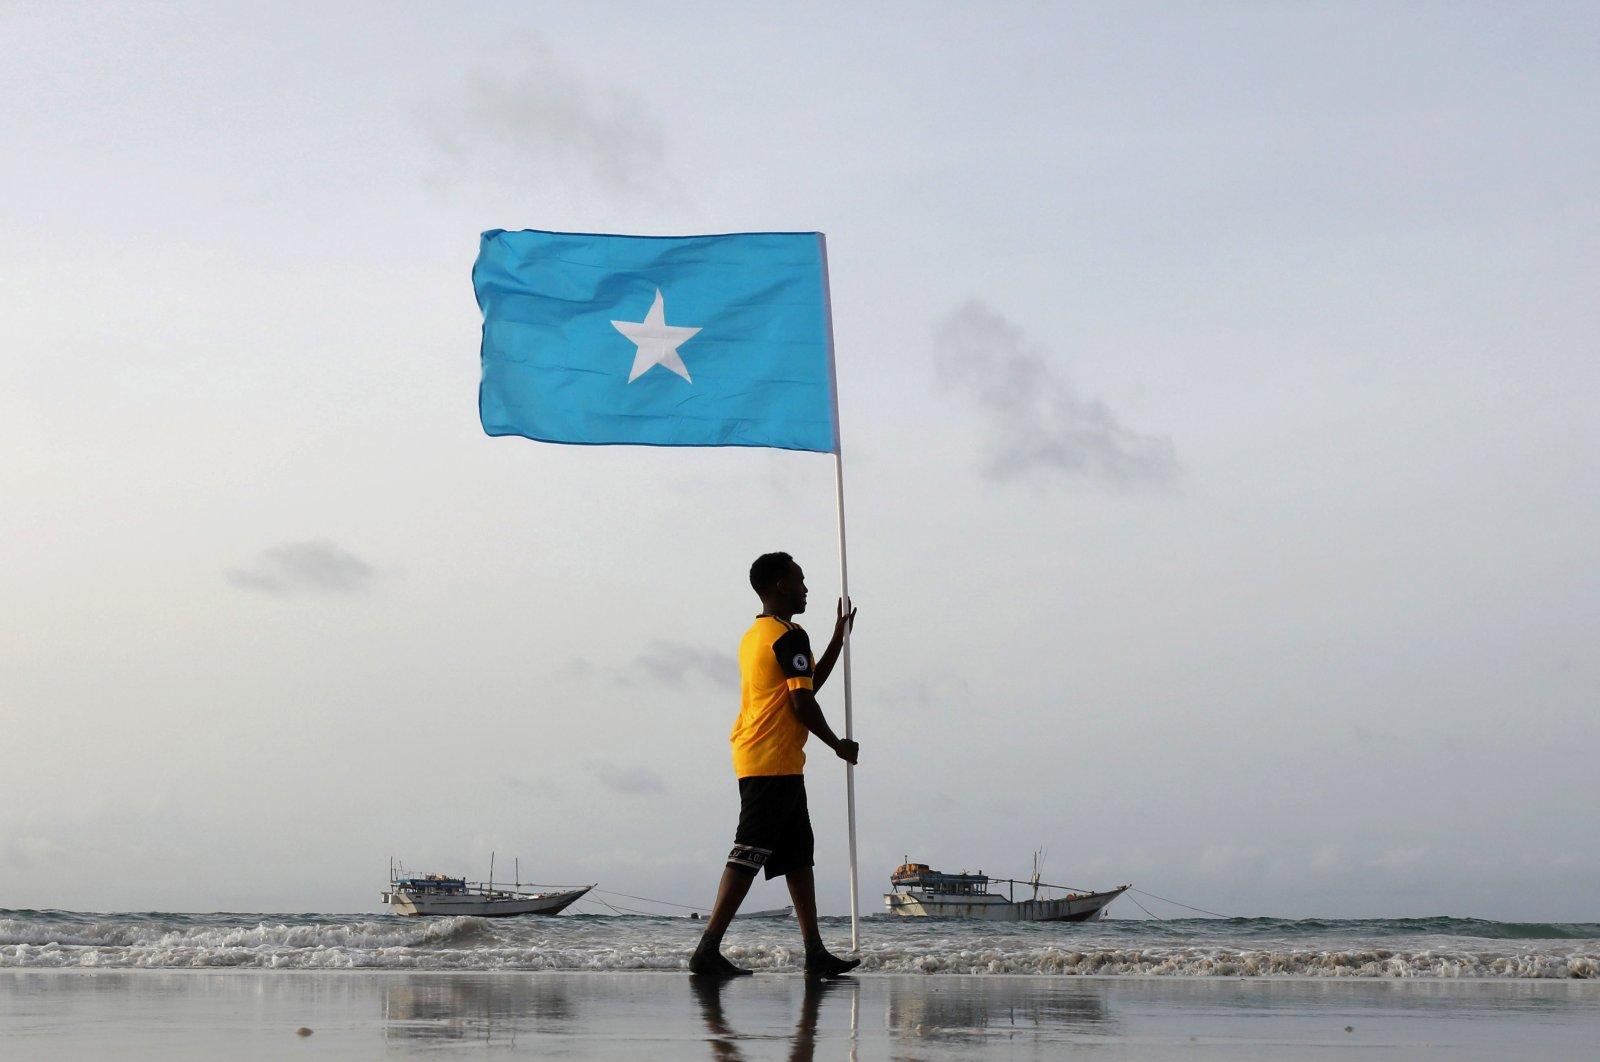 A Somali youth holds the national flag, at Lido beach, Mogadishu's Abdiaziz District, Somalia June 18, 2021. (Reuters Photo)